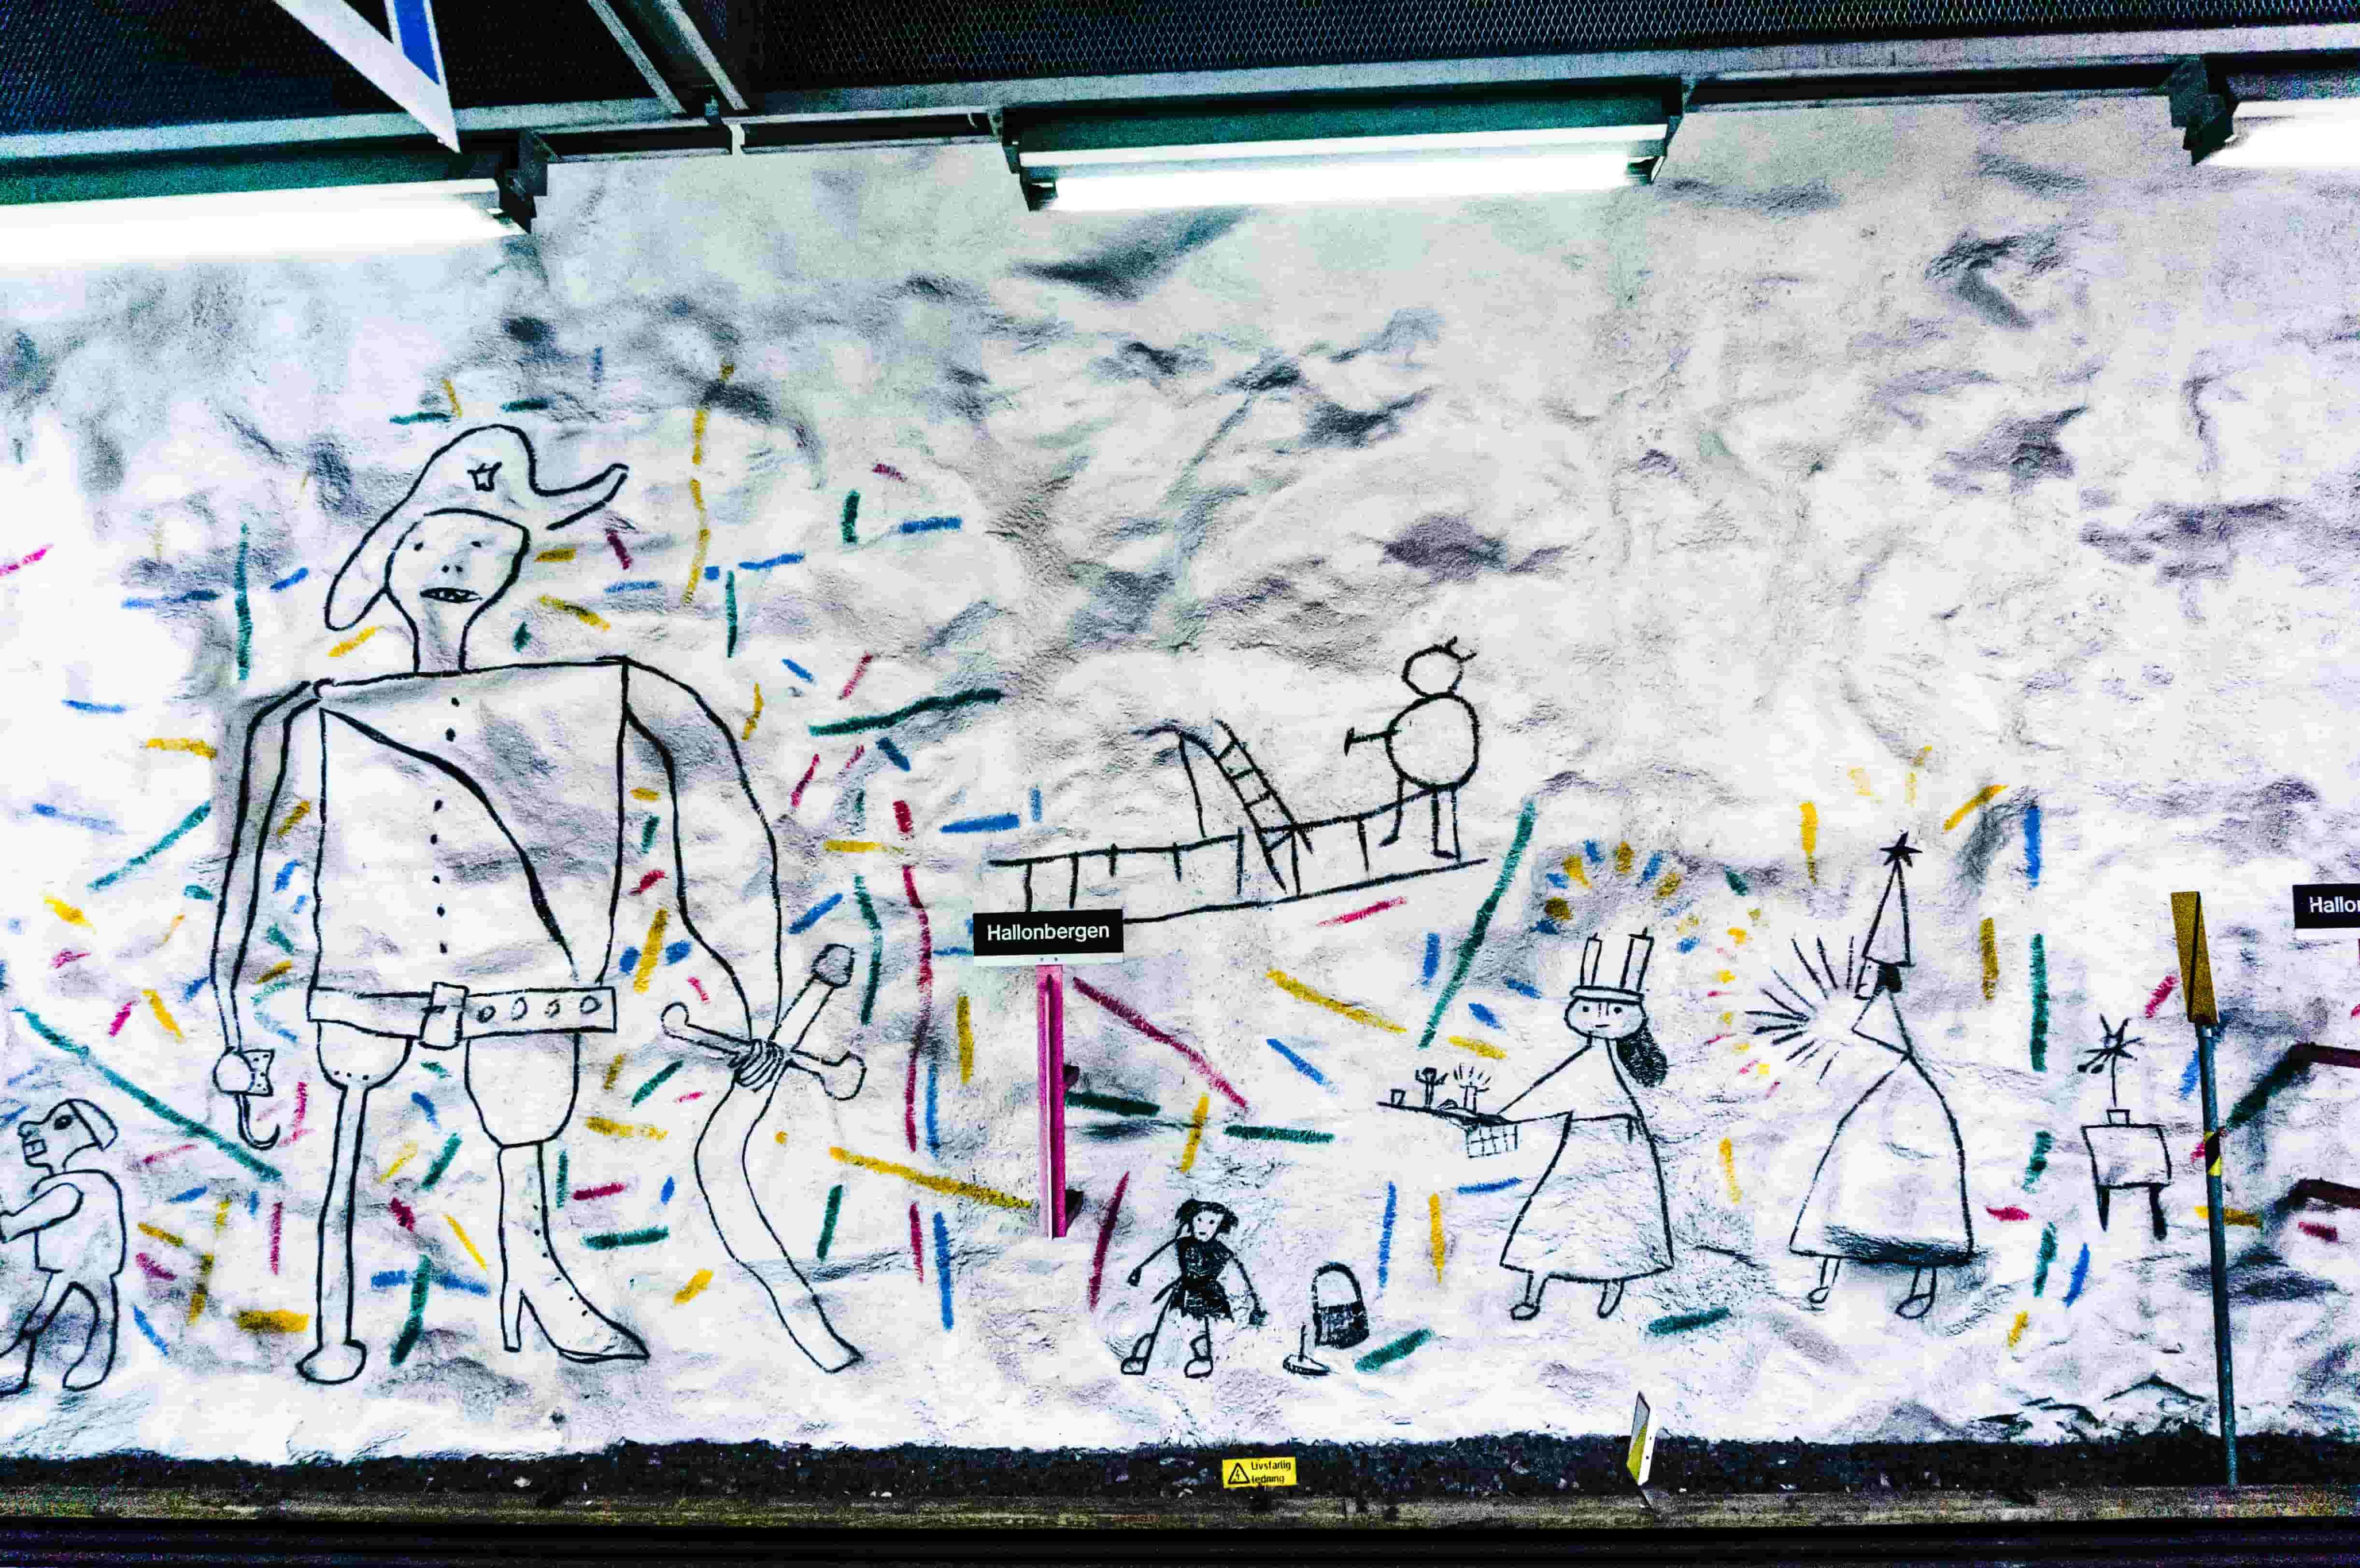 tunnelbanan-hallonberget stockholm